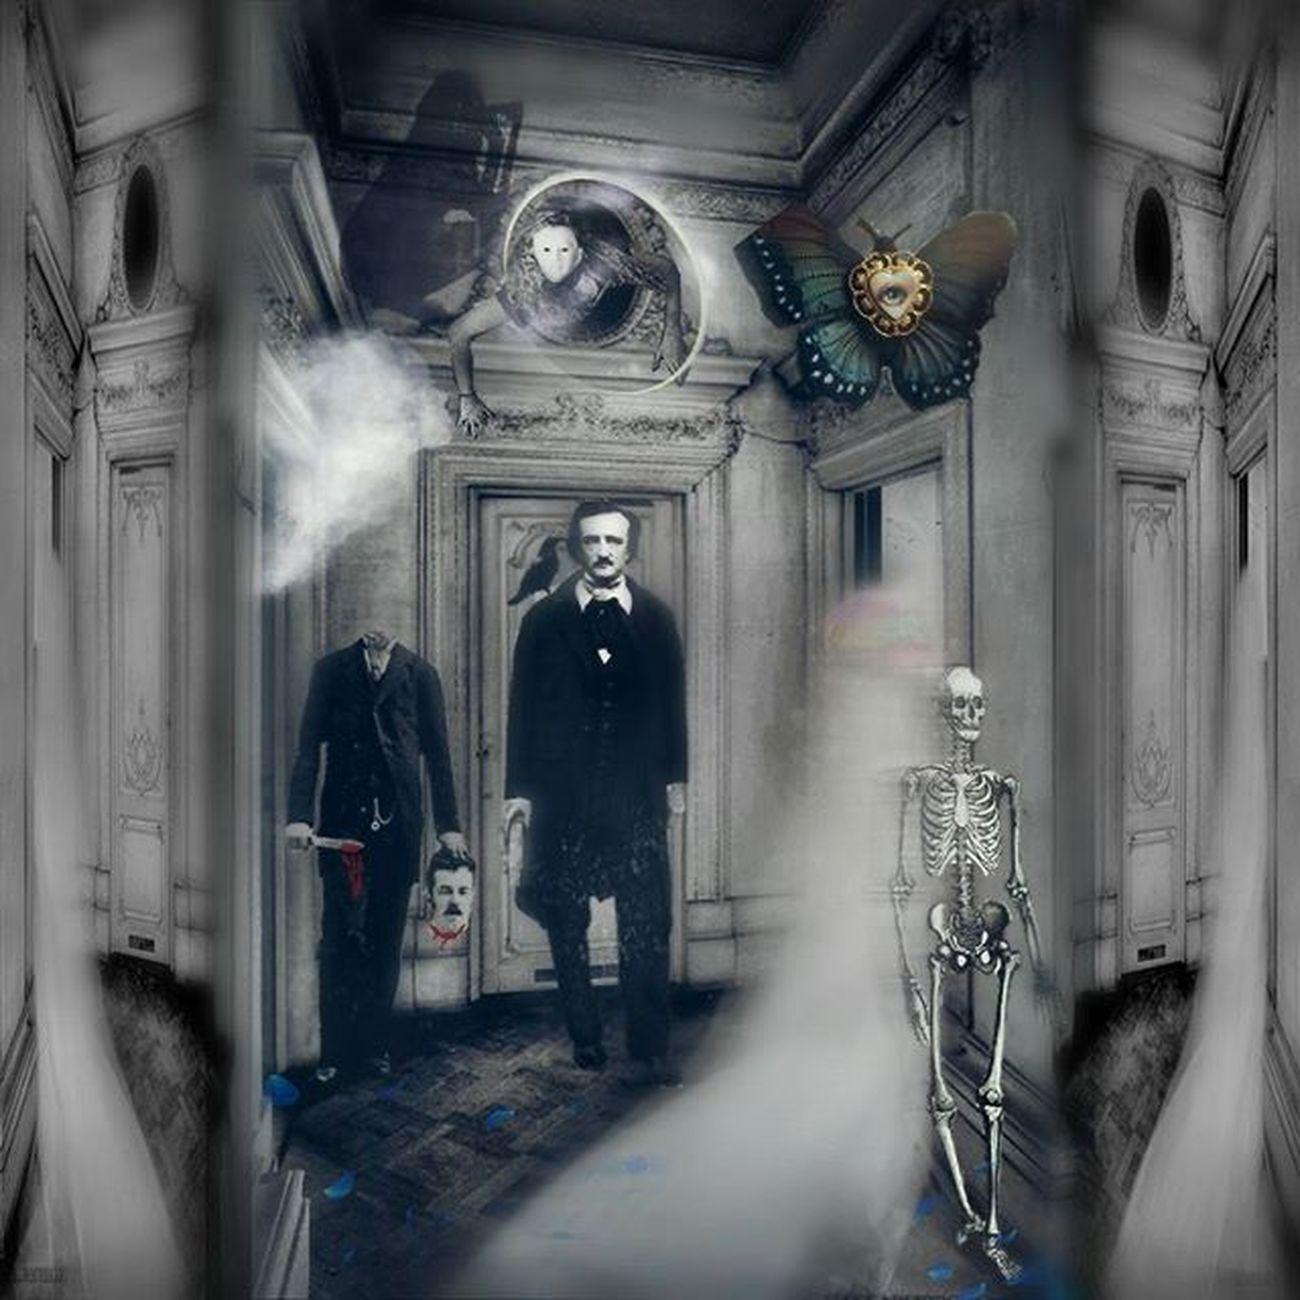 Digitalart  Artvisuals Photocomposite Photoart Conceptart Digitalartwork Loves_edits Masters_of_darkness Friendsofshadowandlight Poe Edgarallanpoe Victorian Death Spirits Ghosts Collage Digitalcollage